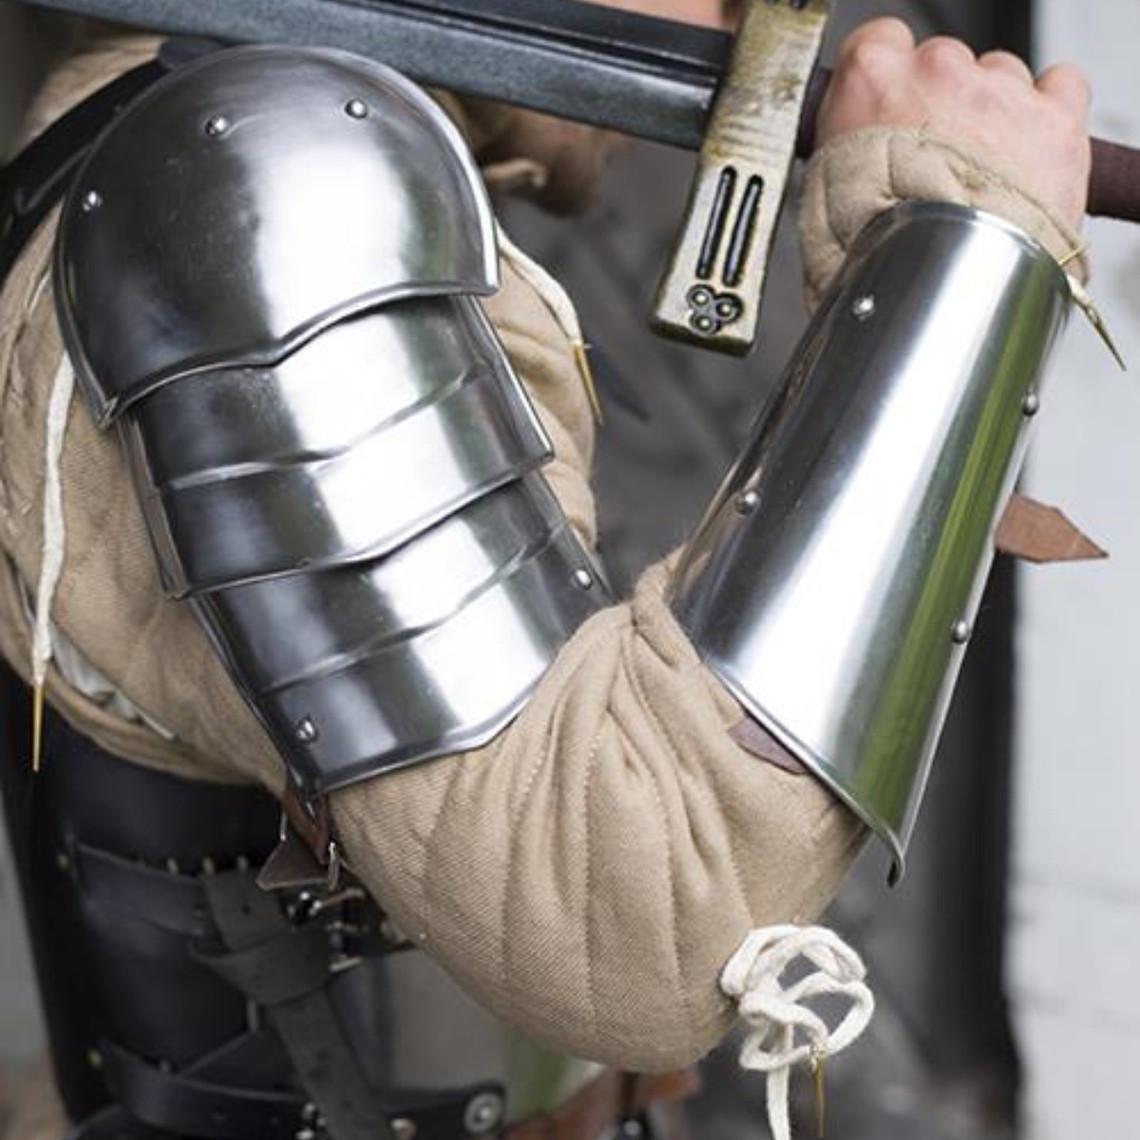 Epic Armoury brazales medievales, par